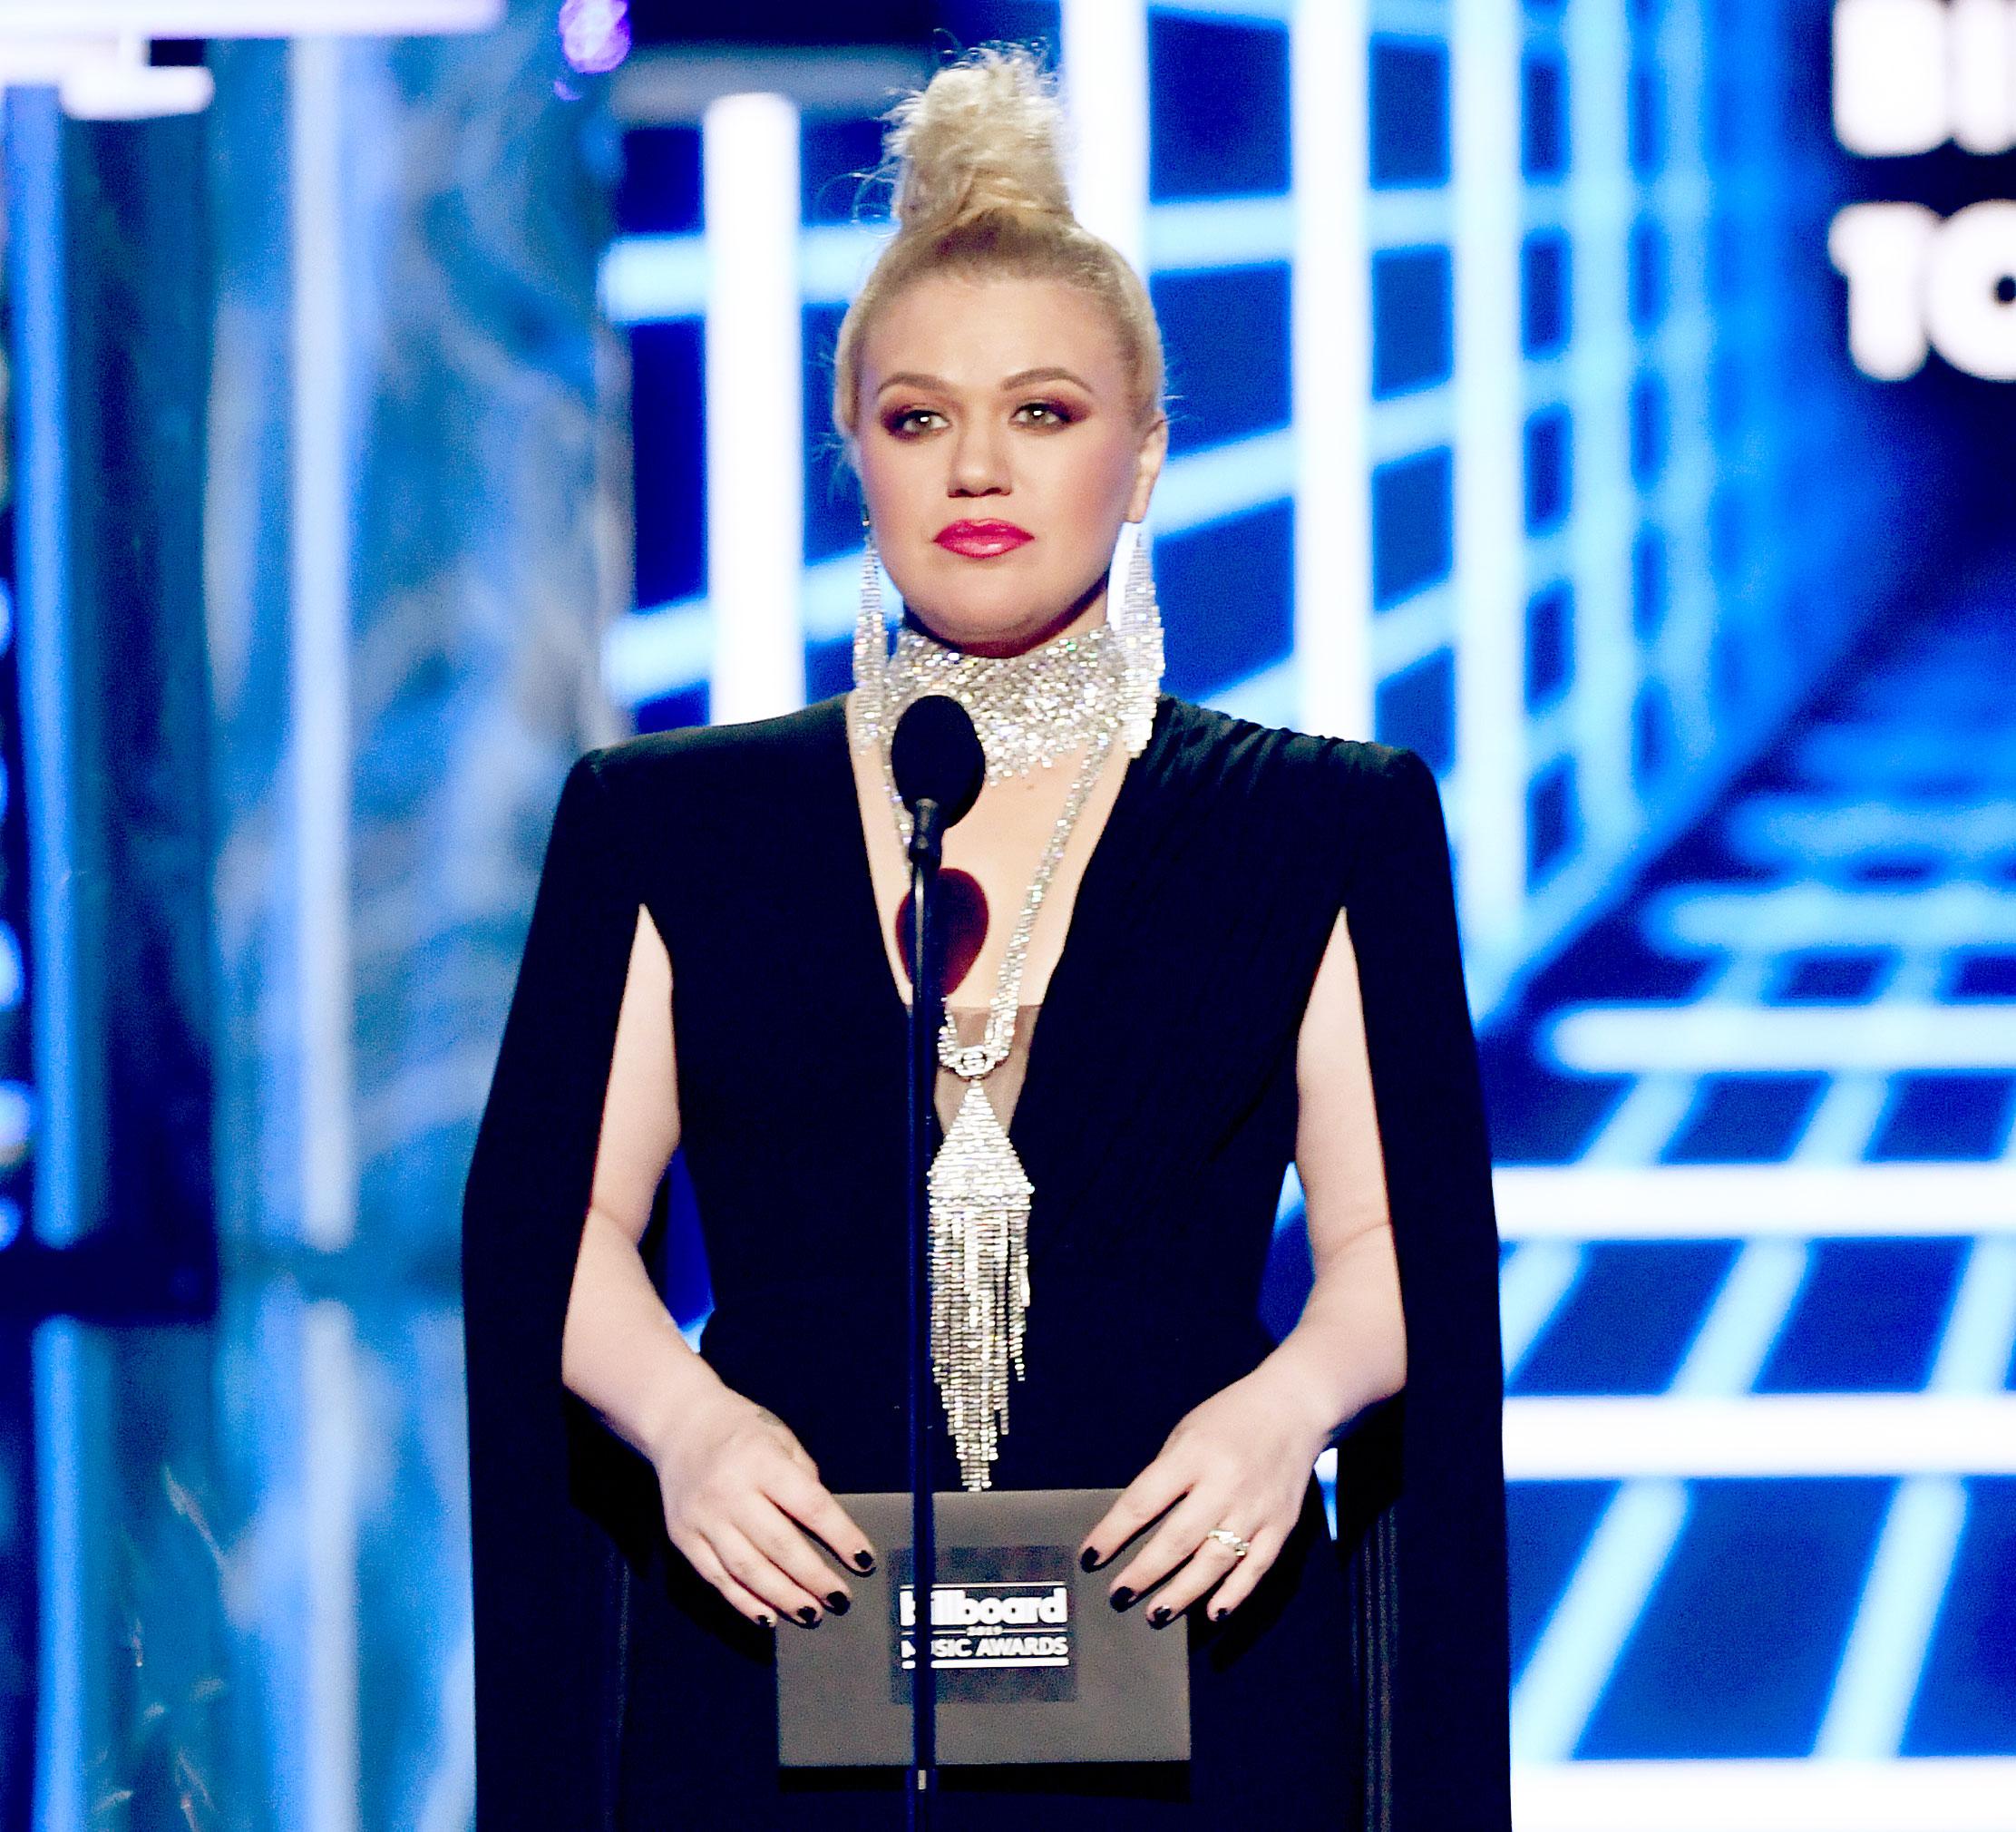 Kelly Clarkson Surgery Scars Billboard Music Awards 2019 Voldemort